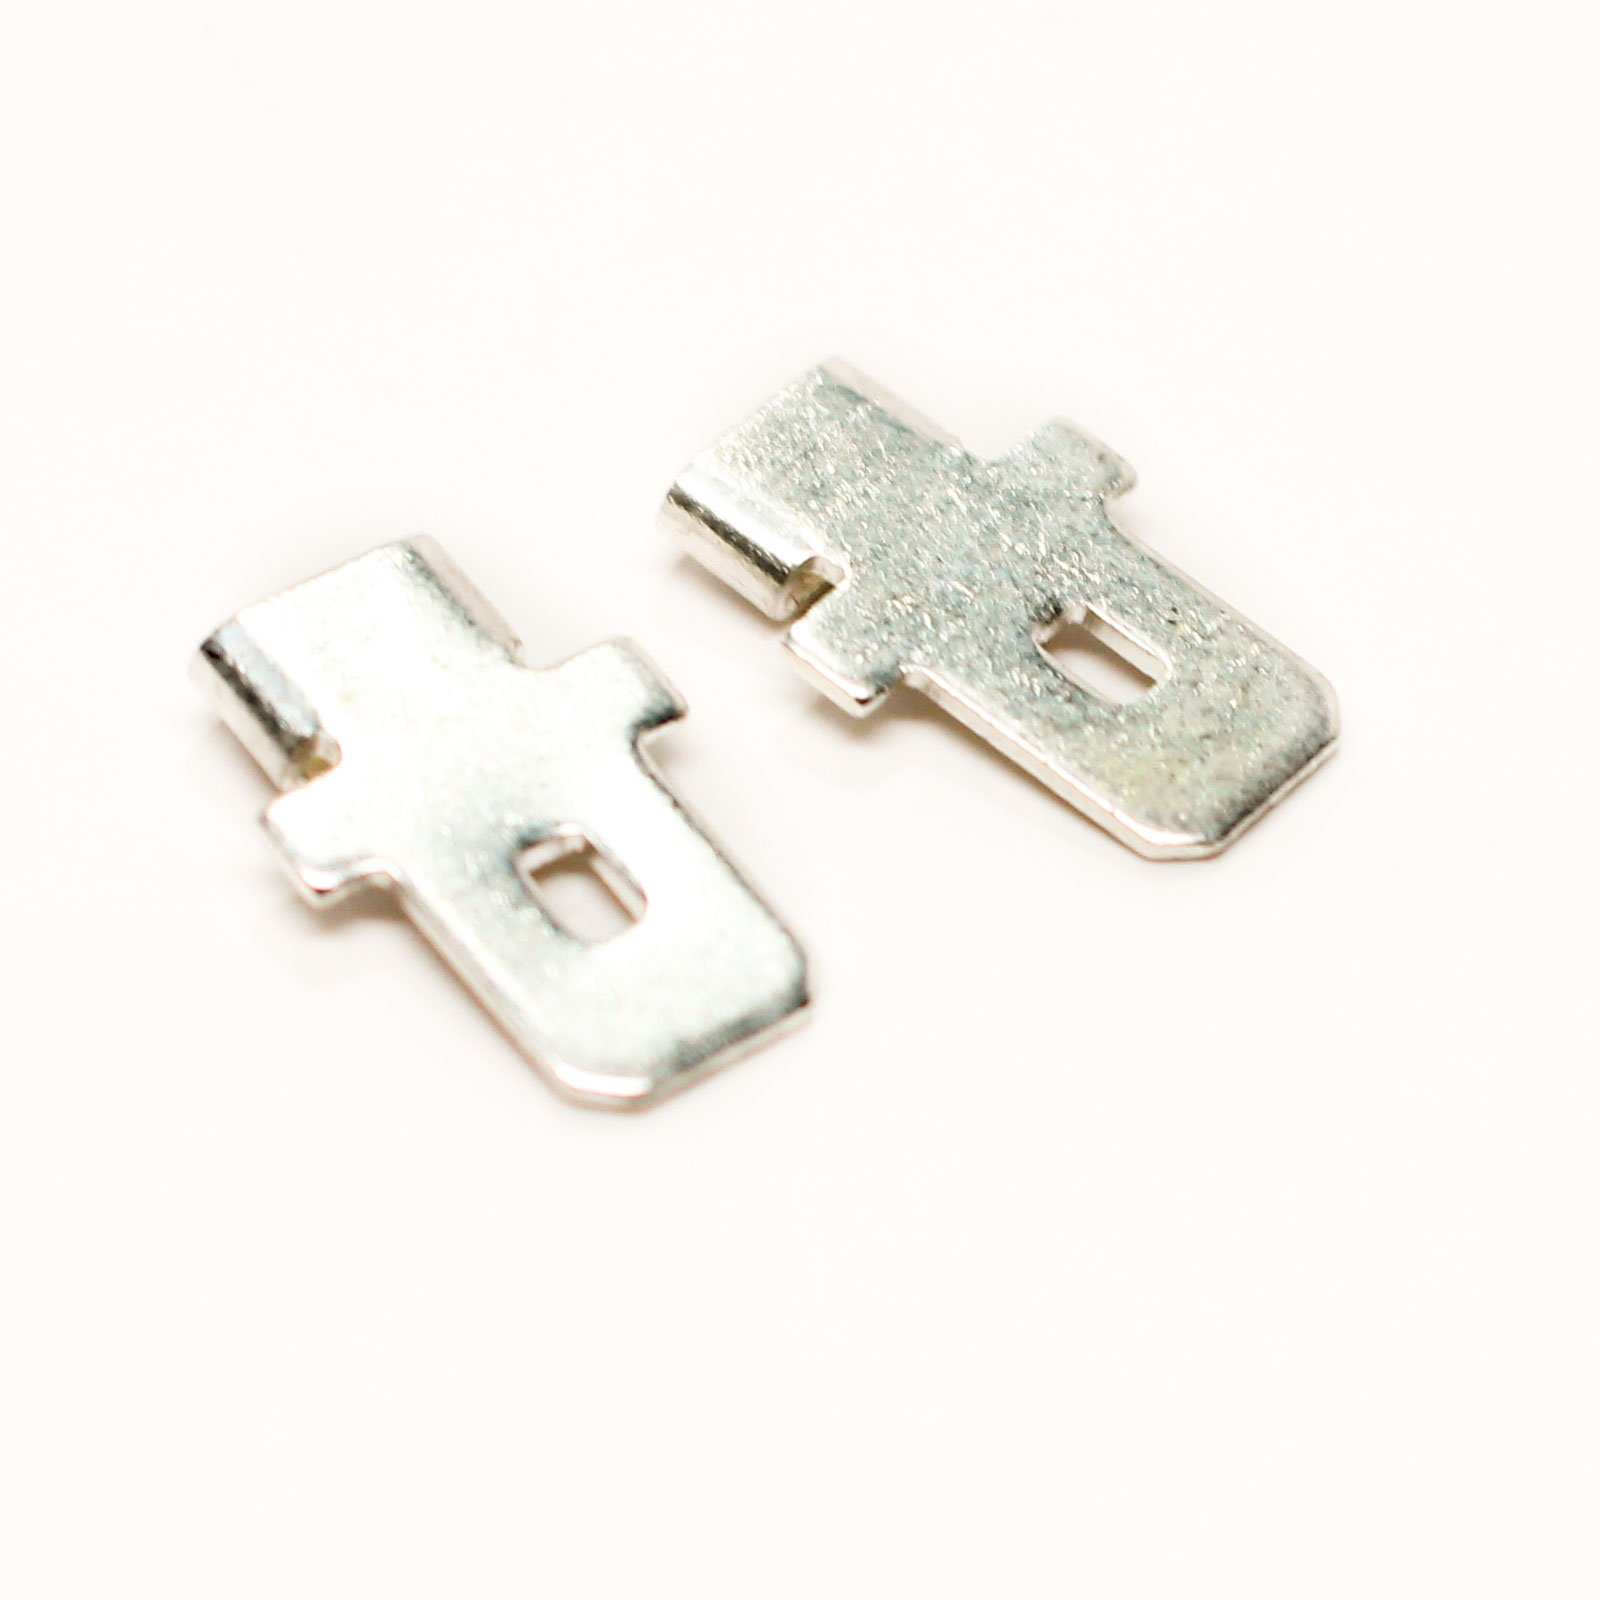 4x Pack - APC SMART-UPS 1500VA USB & SER SUA1500RMUS Battery - Replacement UB1270 Universal Sealed Lead Acid Battery (12V, 7Ah, 7000mAh, F1 Terminal, AGM, SLA) - Includes 8 F1 to F2 Terminal Adapters by UpStart Battery (Image #7)